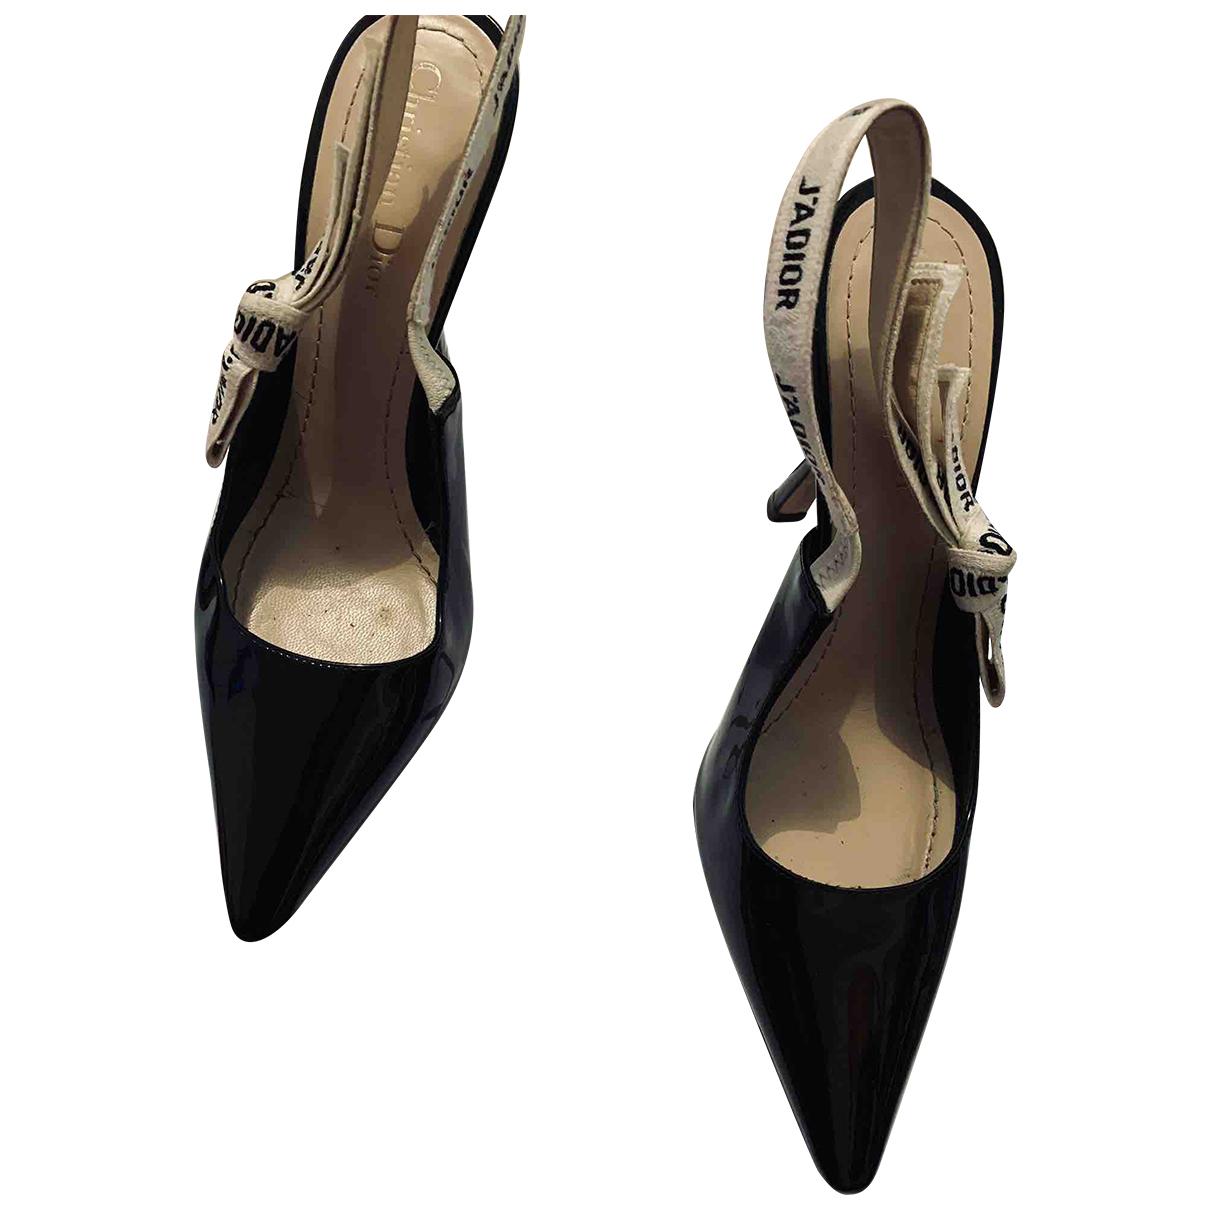 Dior - Escarpins Jadior pour femme en cuir verni - noir